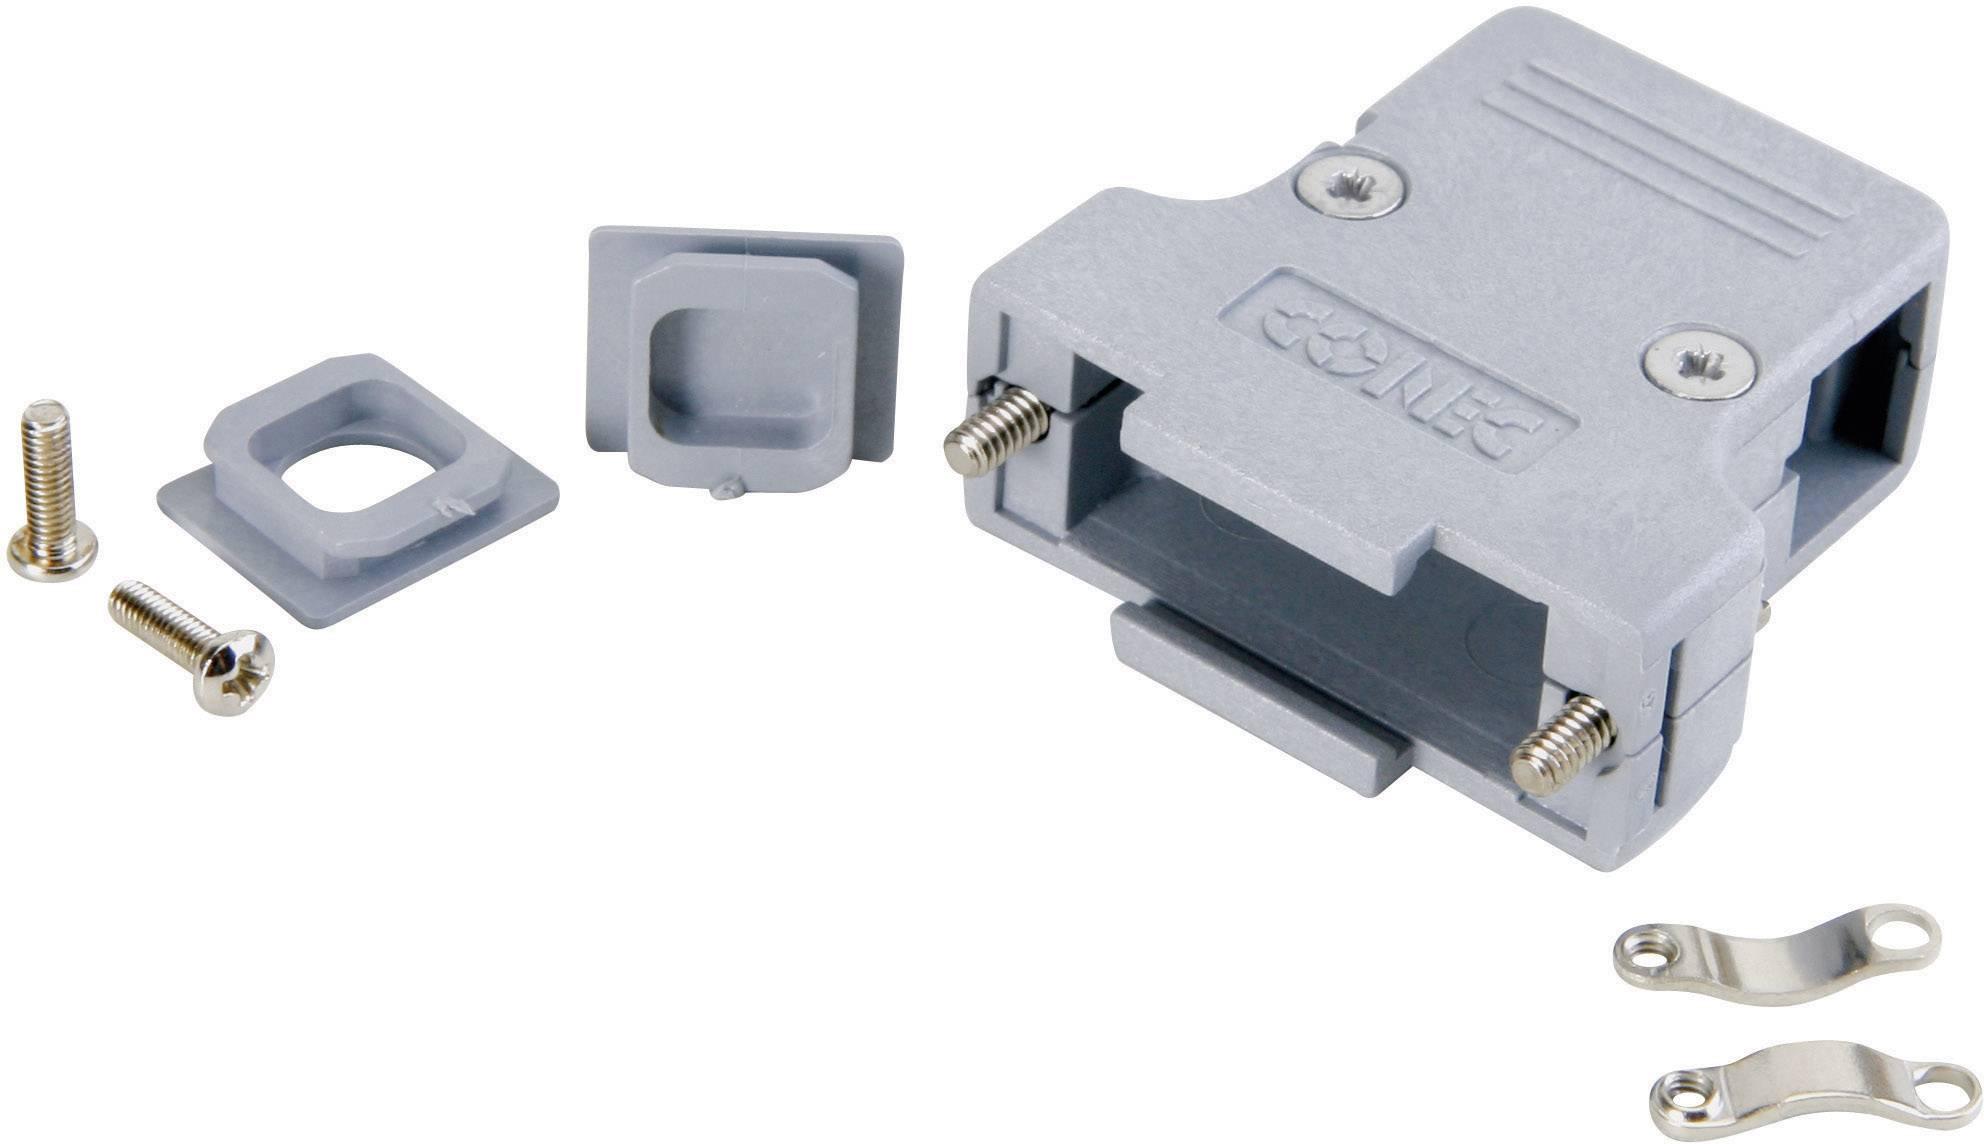 D-SUB pouzdro Conec 165X11909XE 165X11909XE, pólů 50, plast, 180 °, šedá, 1 ks